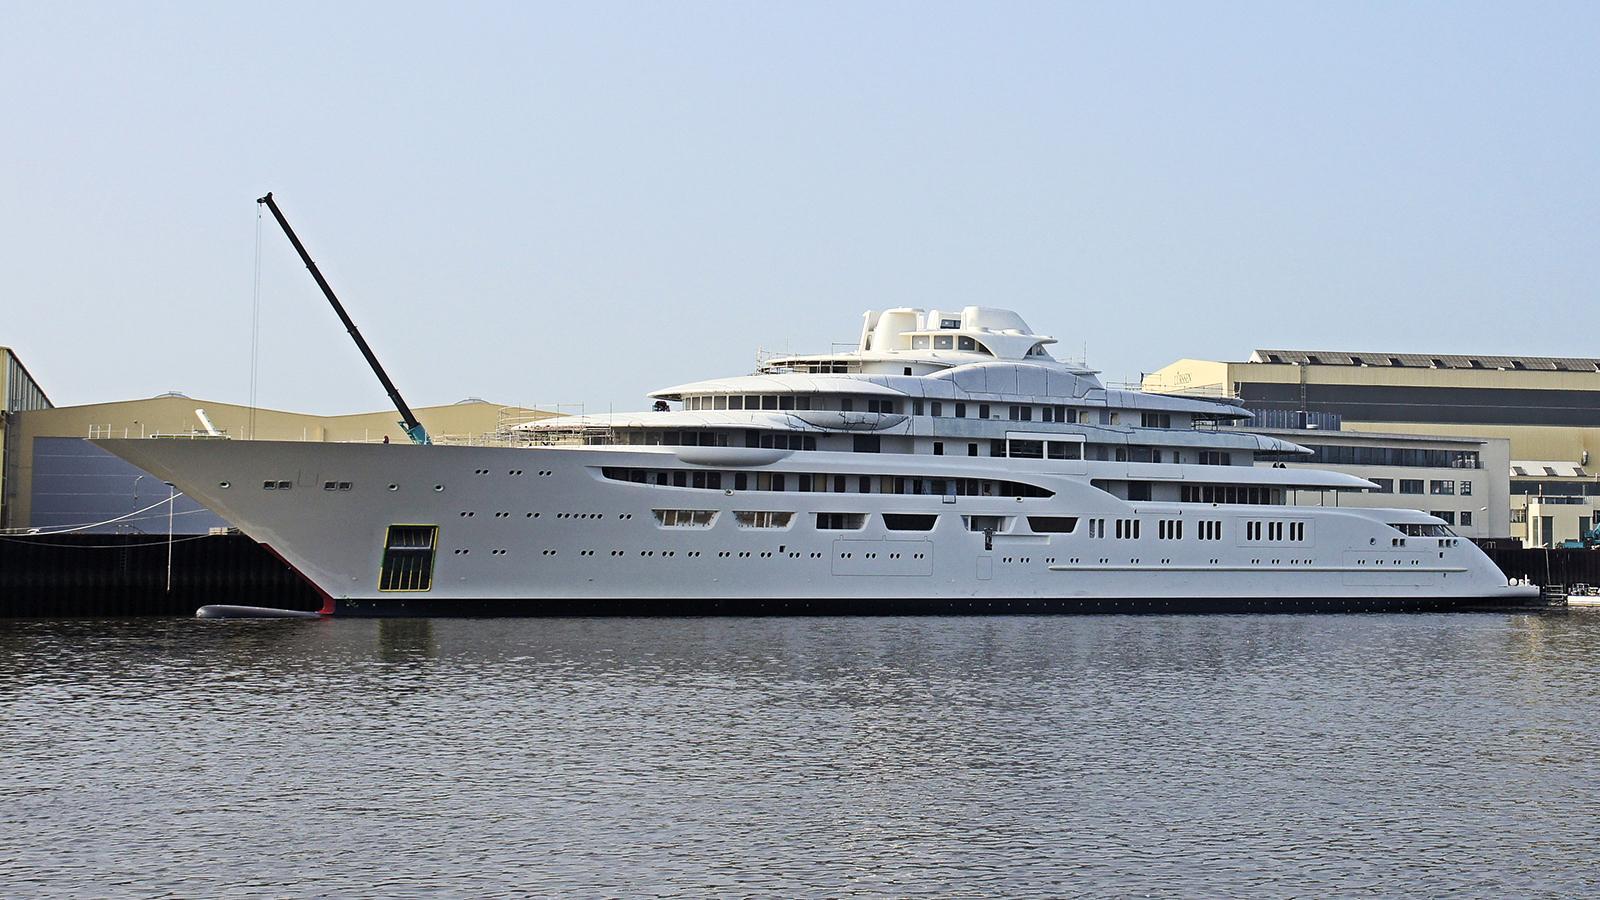 dilbar-motor-yacht-lurssen-2016-156m-shipyard-moored